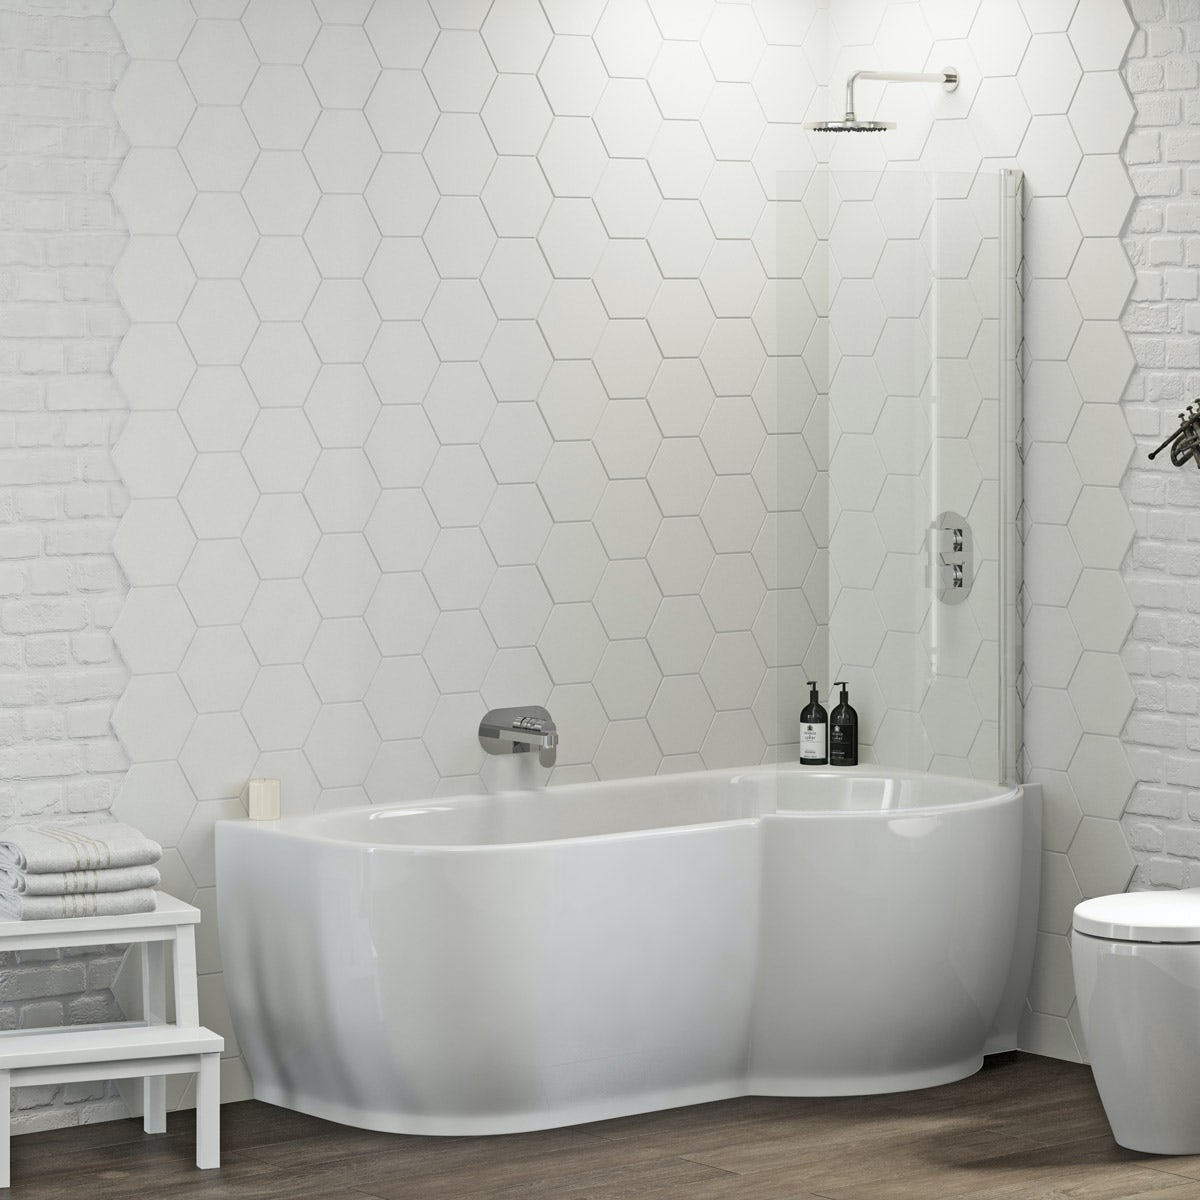 freestanding bath shower screen mobroi com shower screens for p shaped baths maine freestanding bath screen